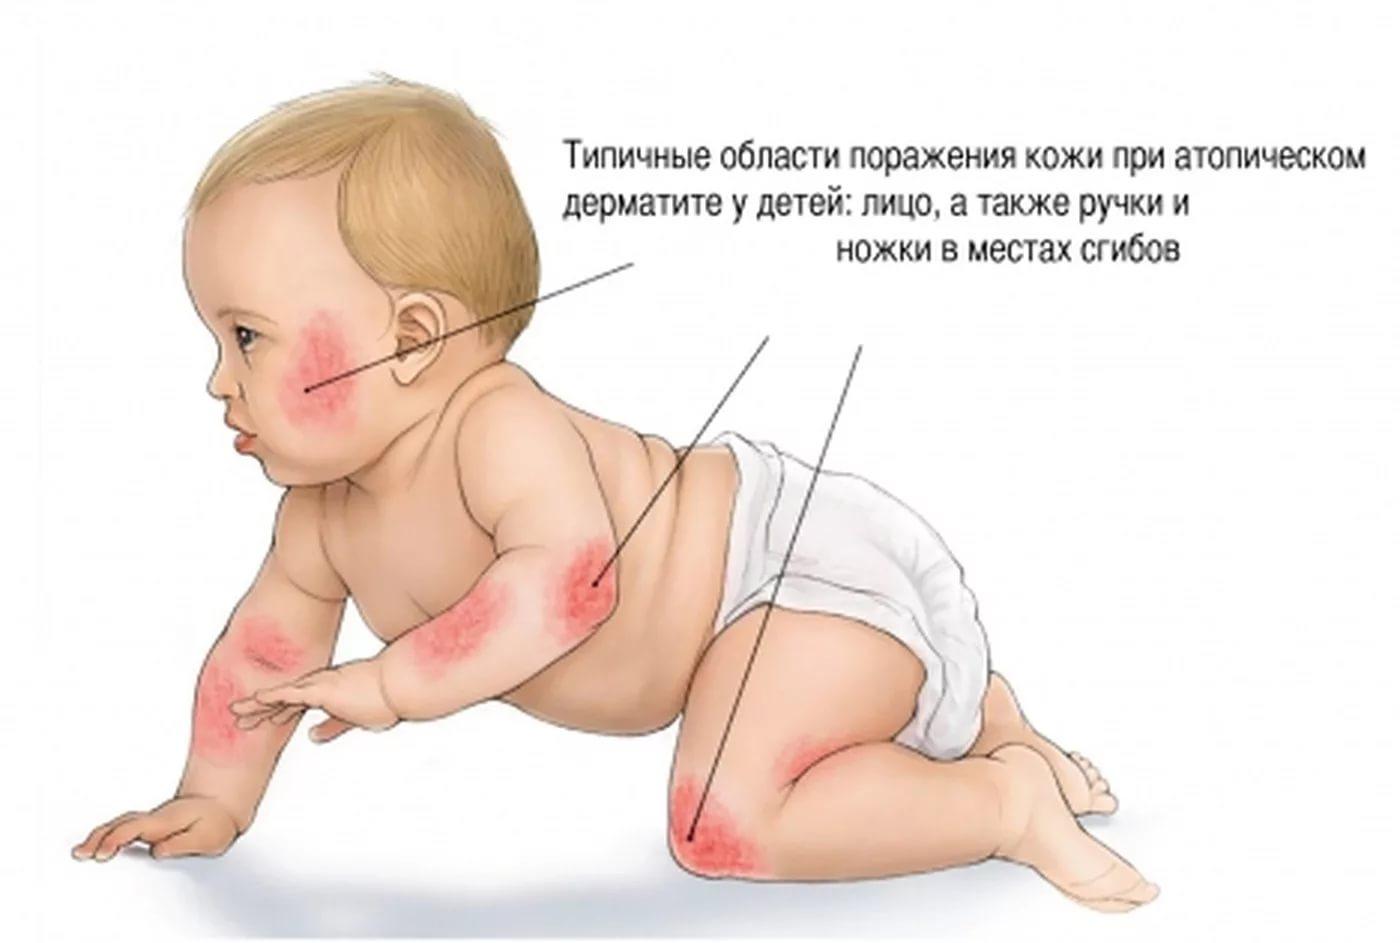 Атопический дерматит у младенца